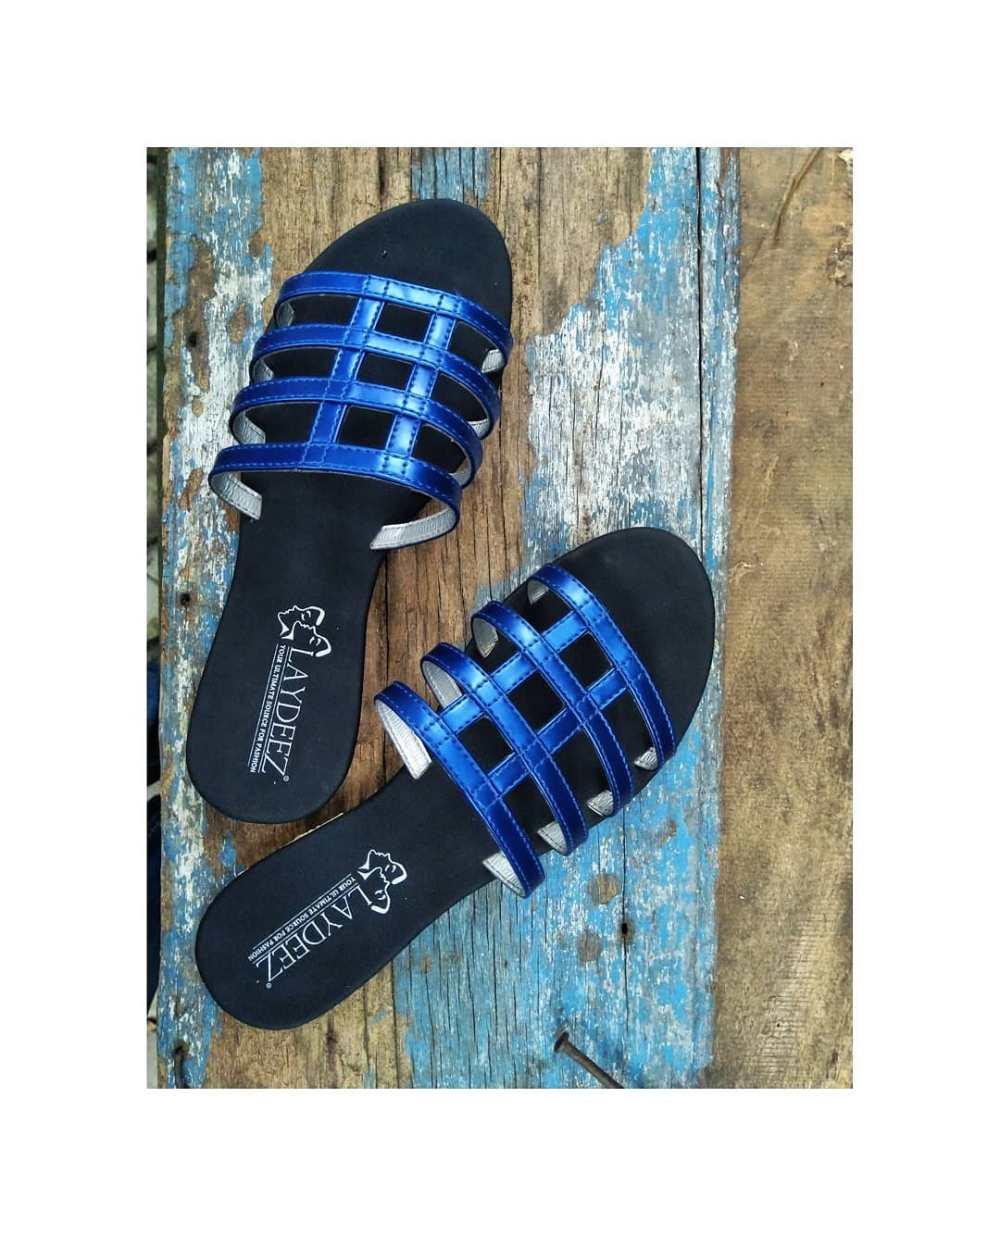 Laydeez Holed Slides in Metallic Blue